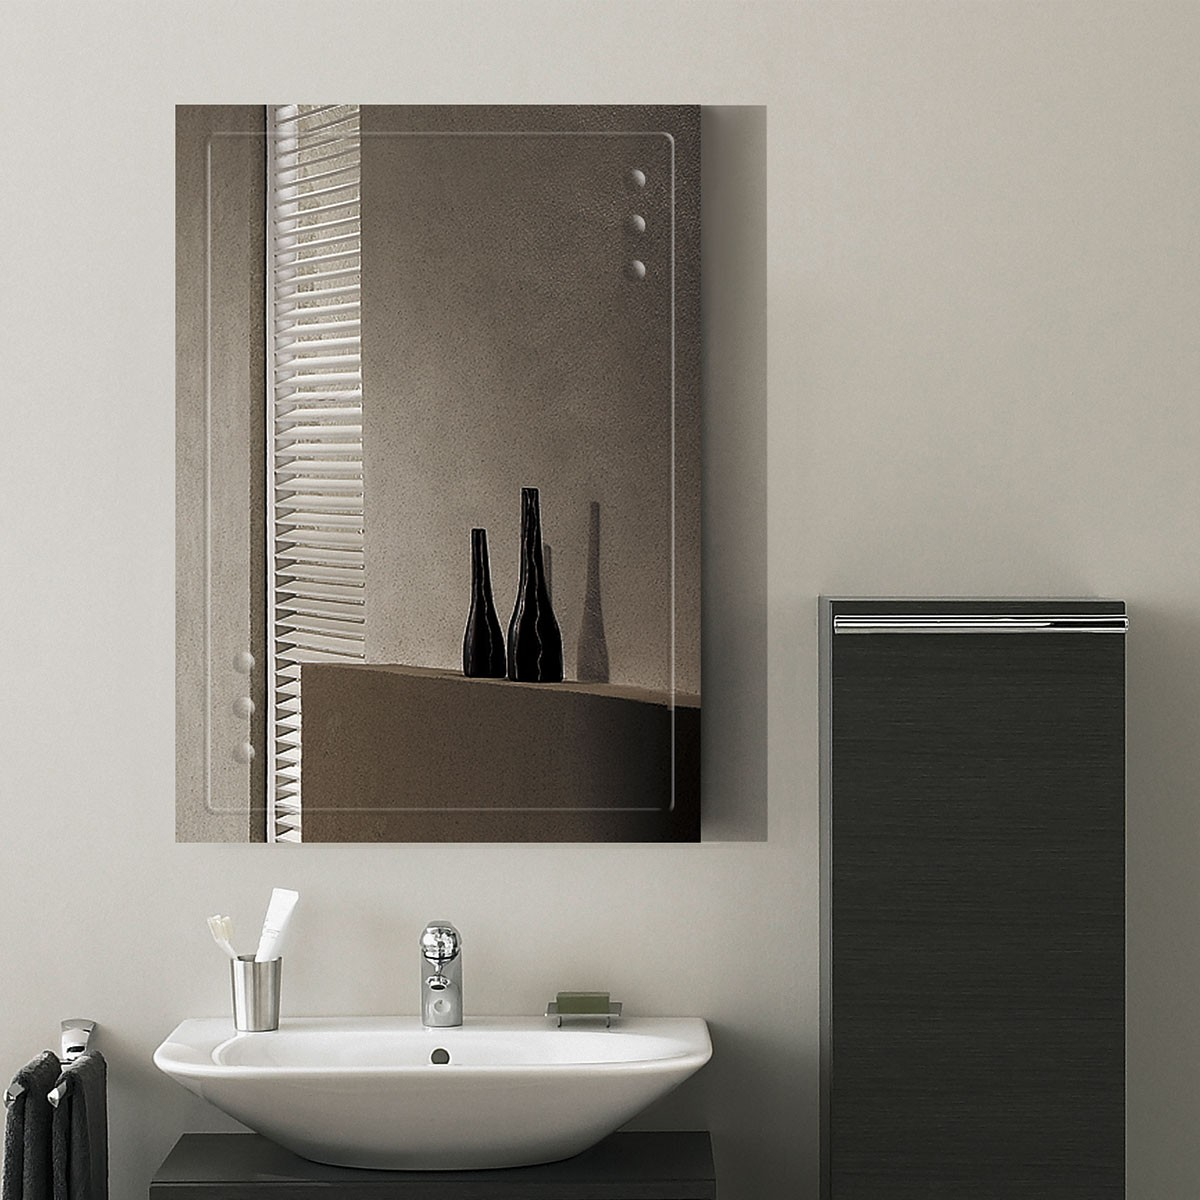 28 X 20 Po Miroir Mural Salle De Bain Classique